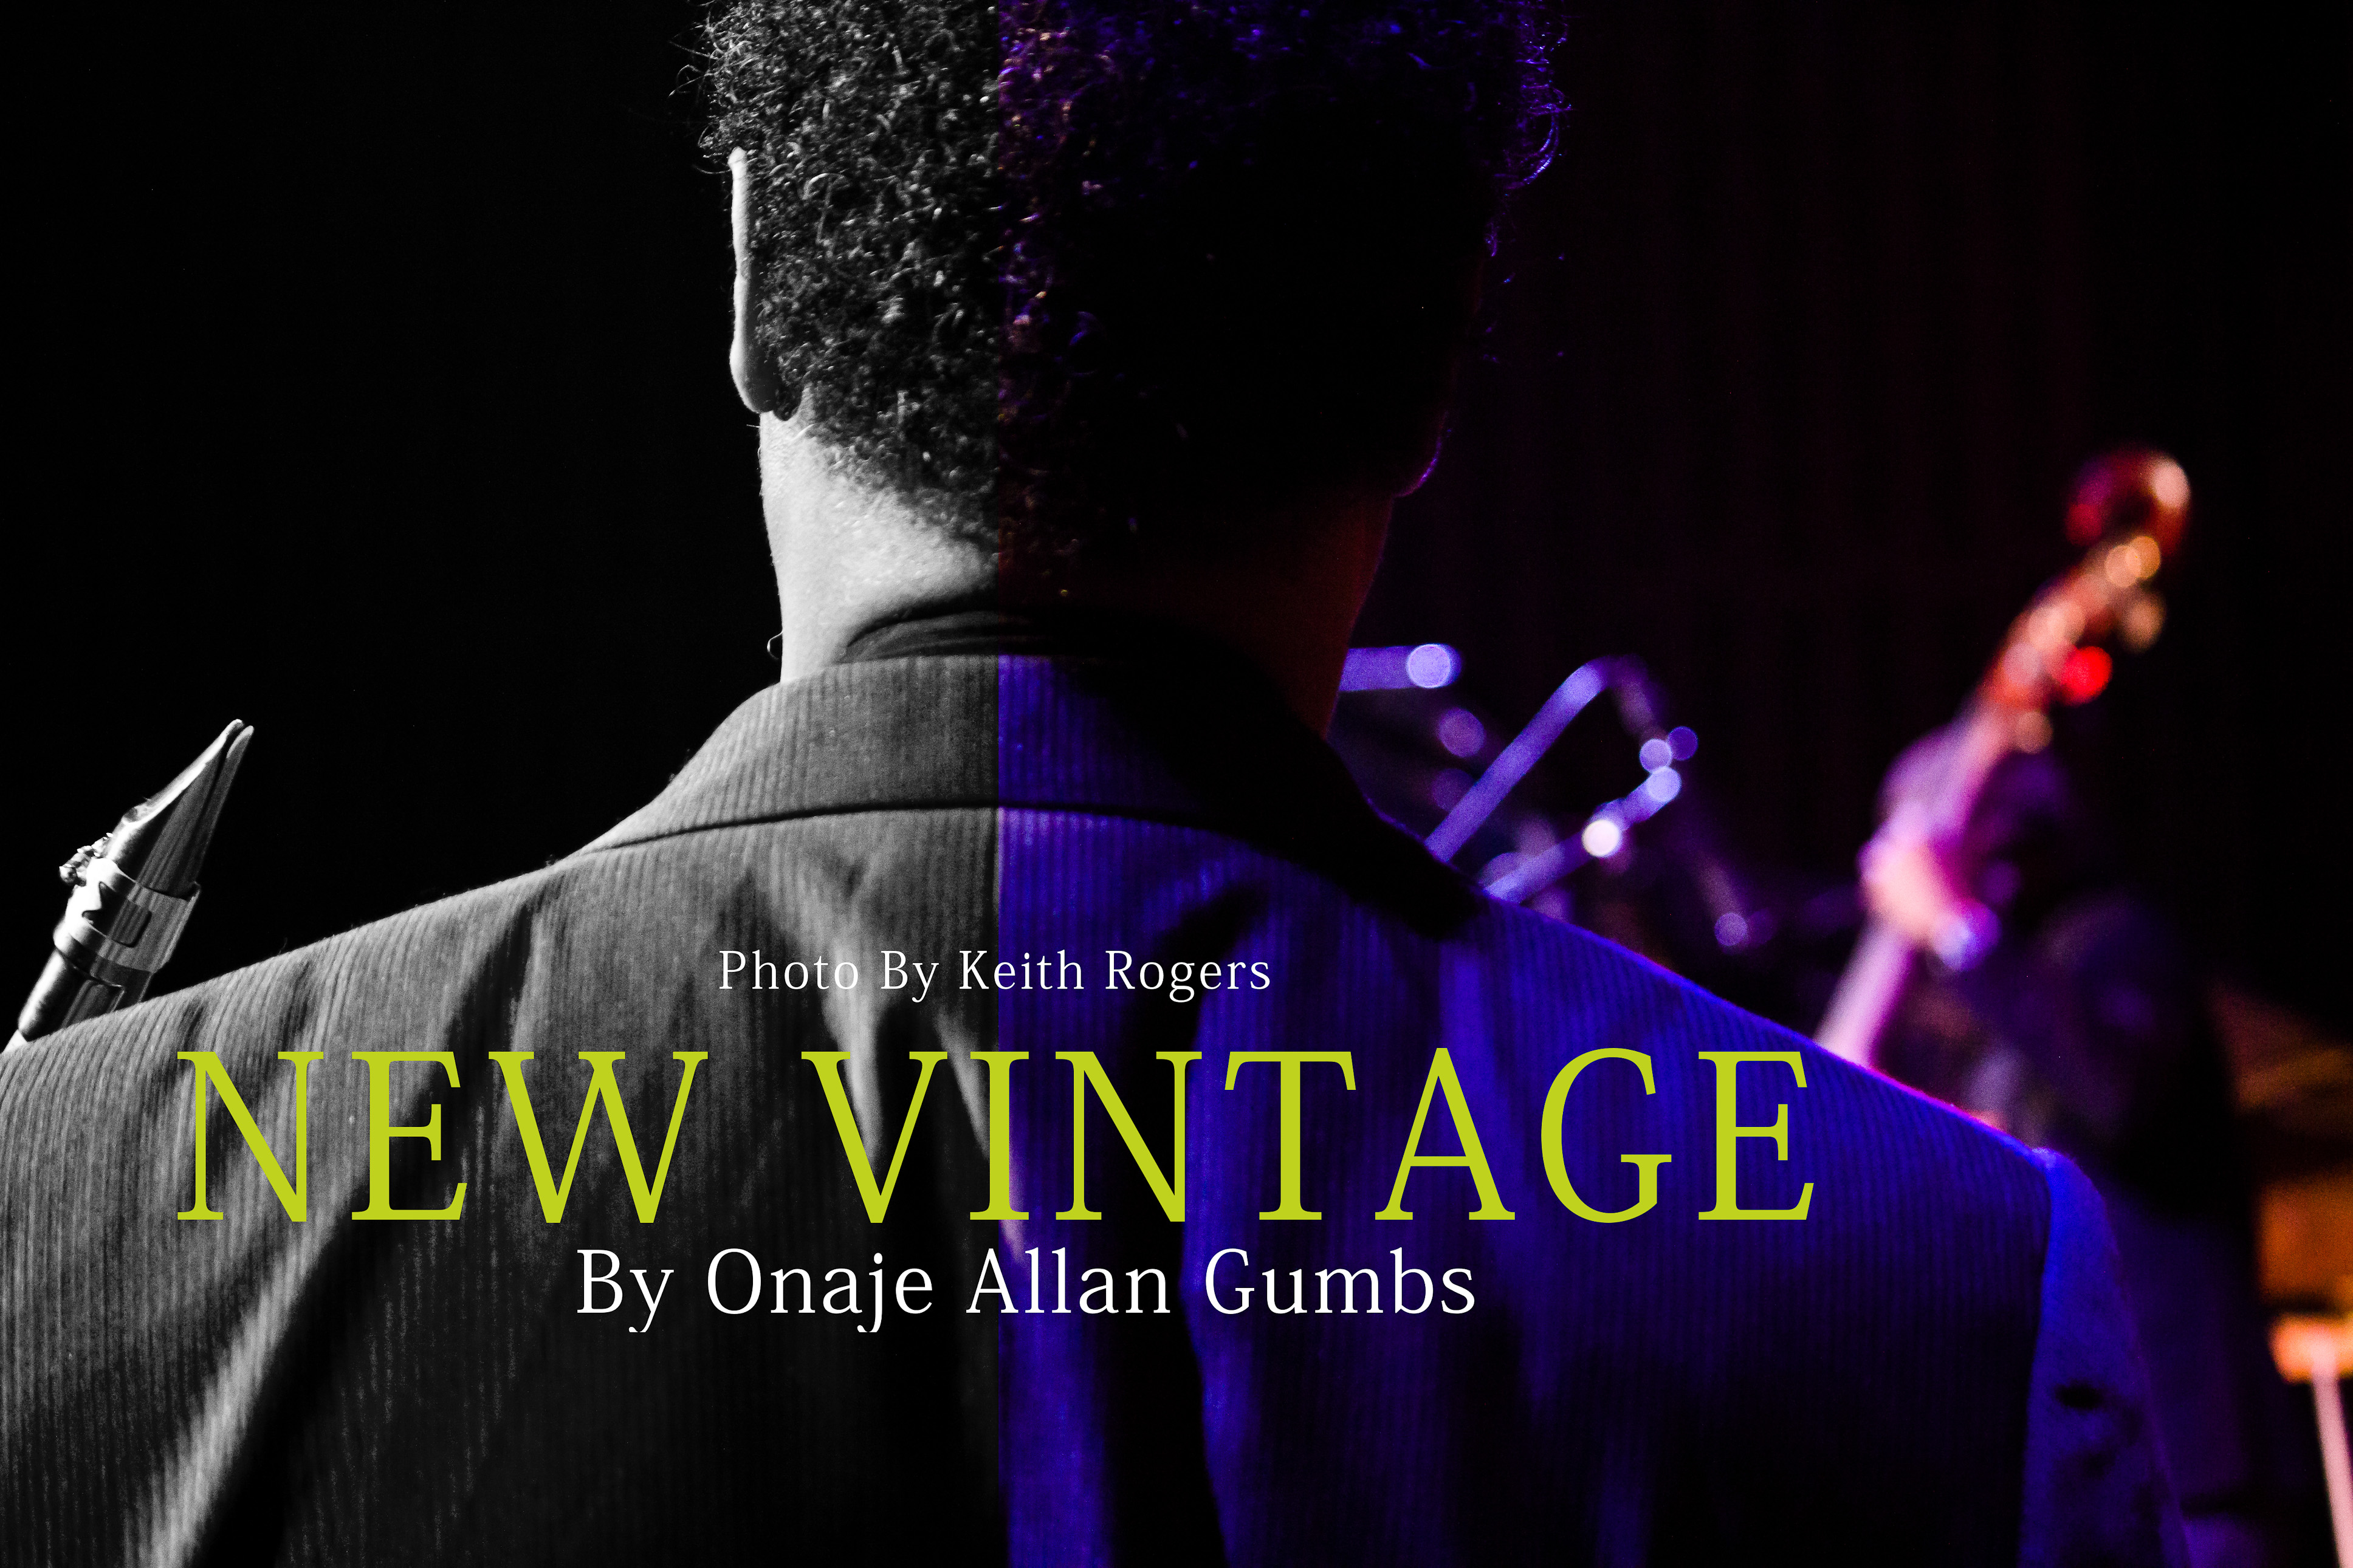 Onaje Allan Gumbs New Vintage 2.28.13